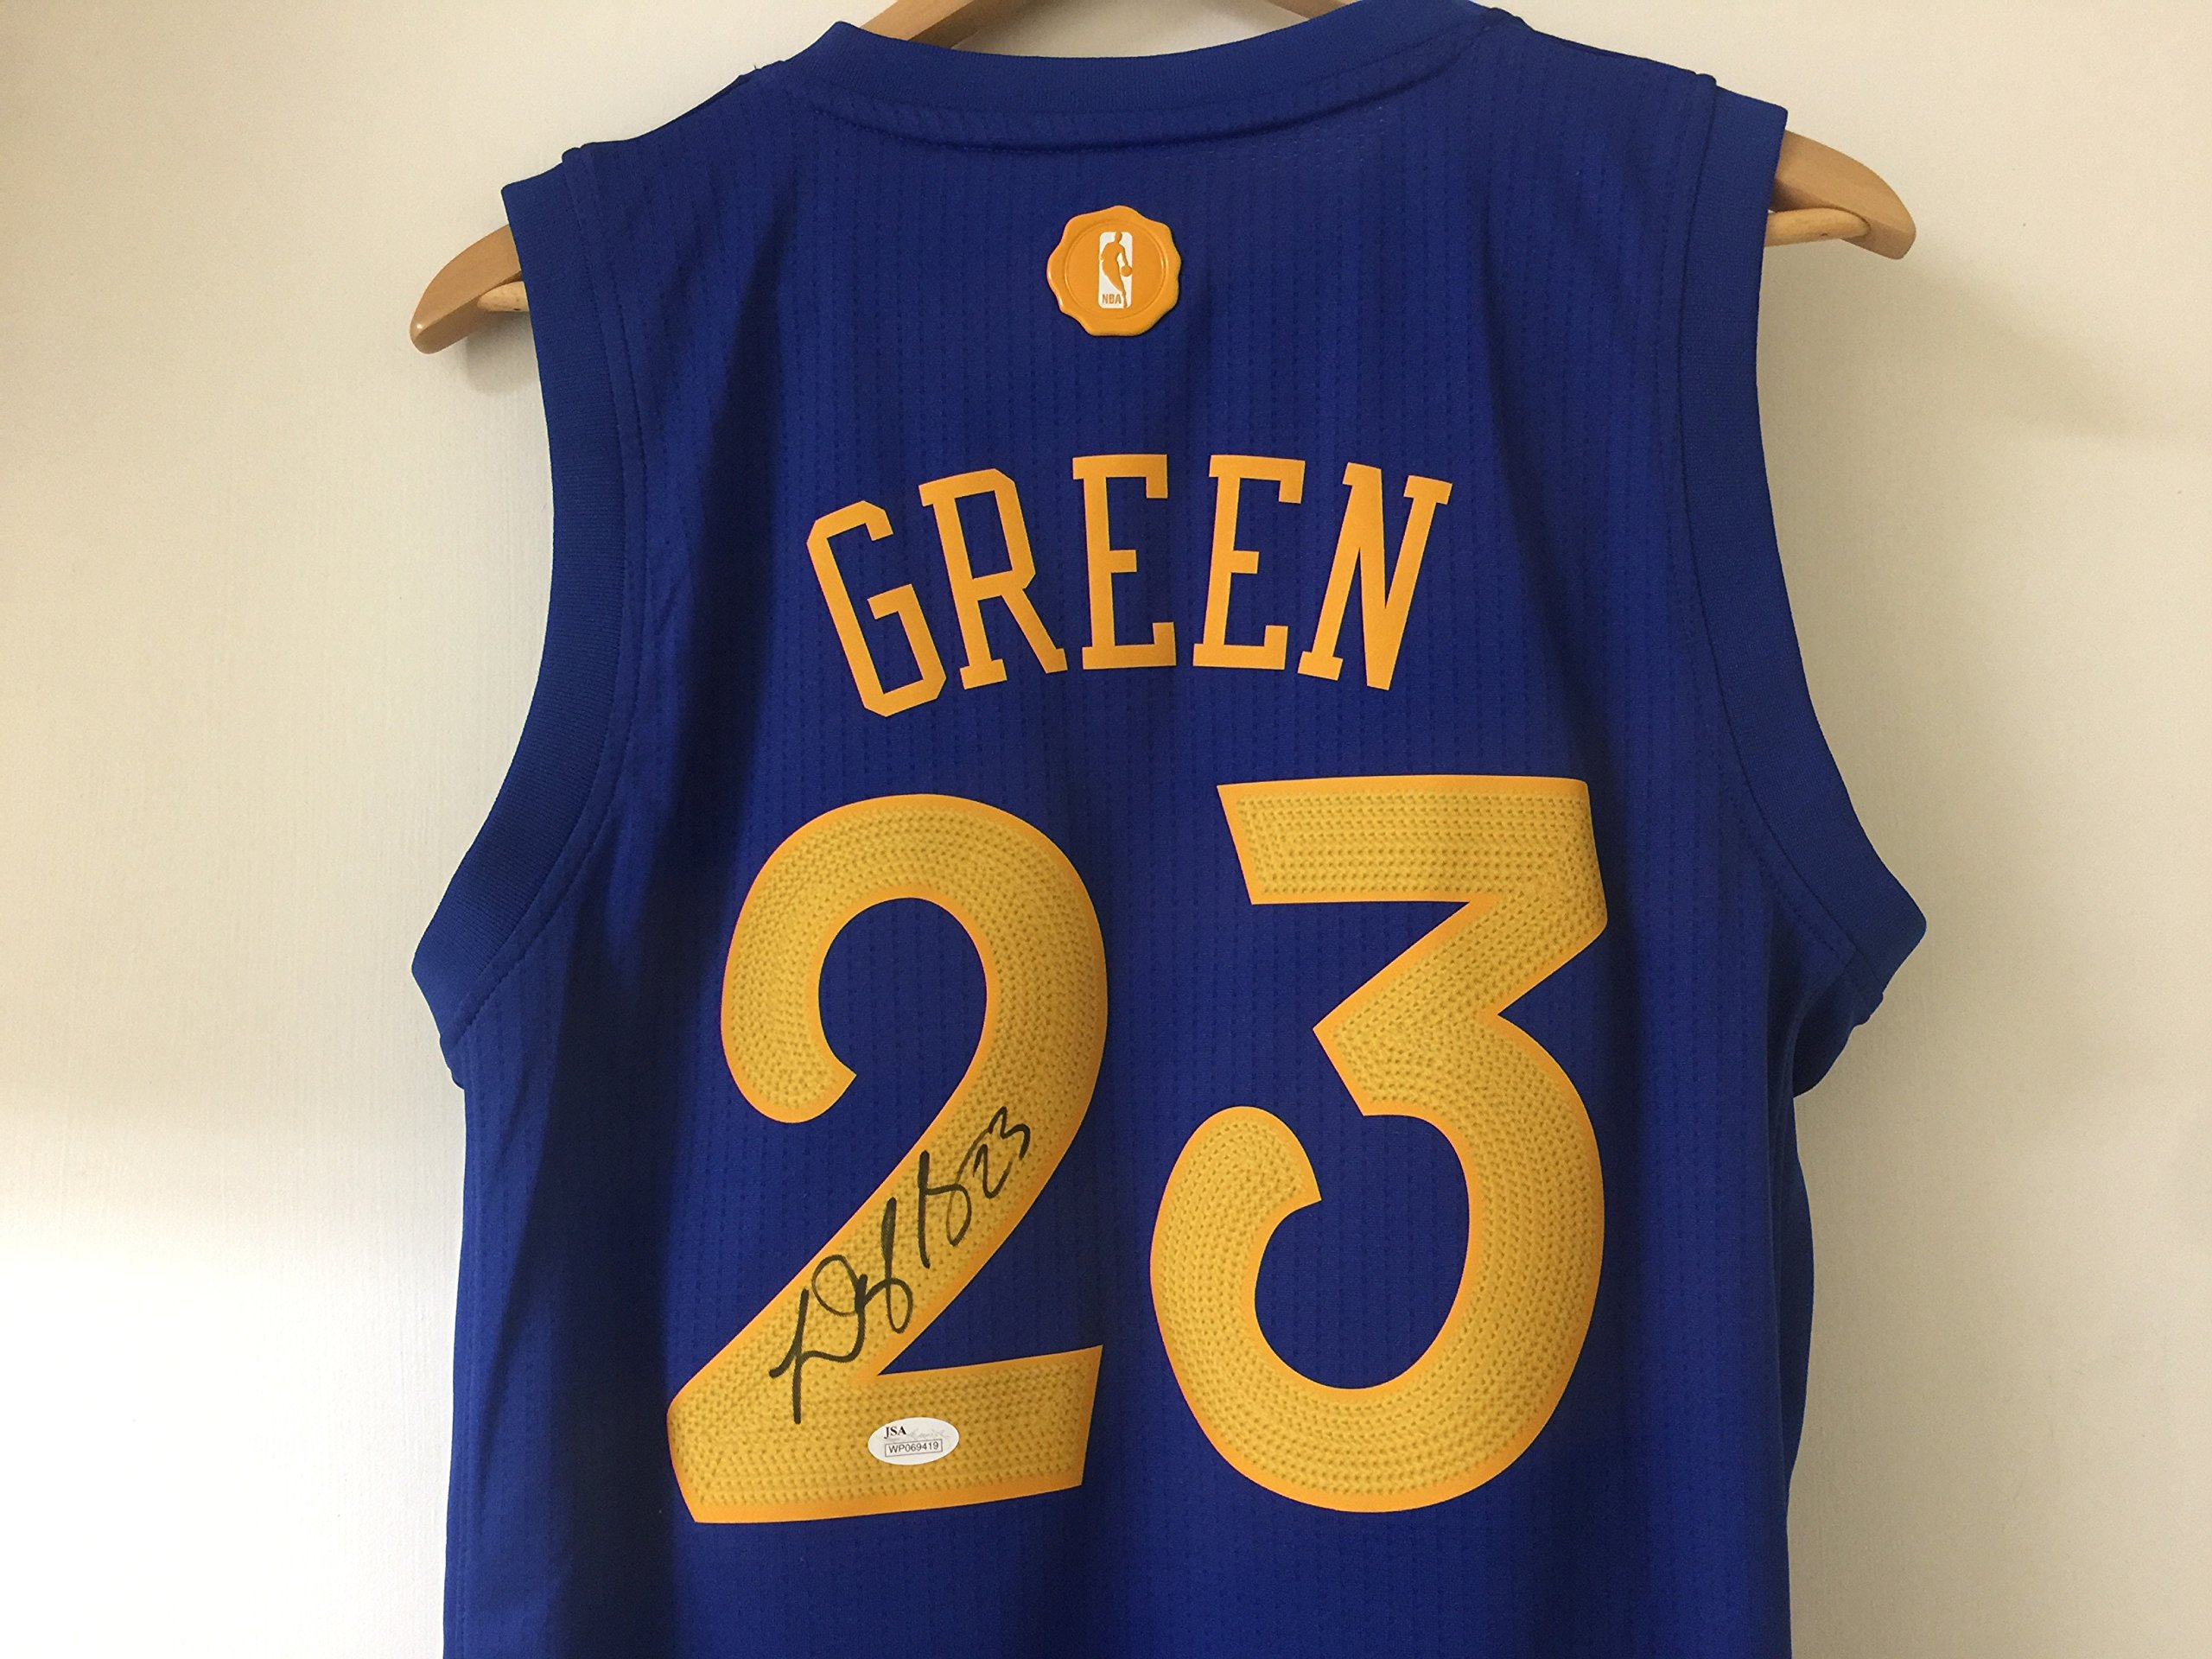 Draymond Green GSW Signed Christmas Swingman Jersey JSA WP Certified Autographed NBA Jersey by Draymond Green